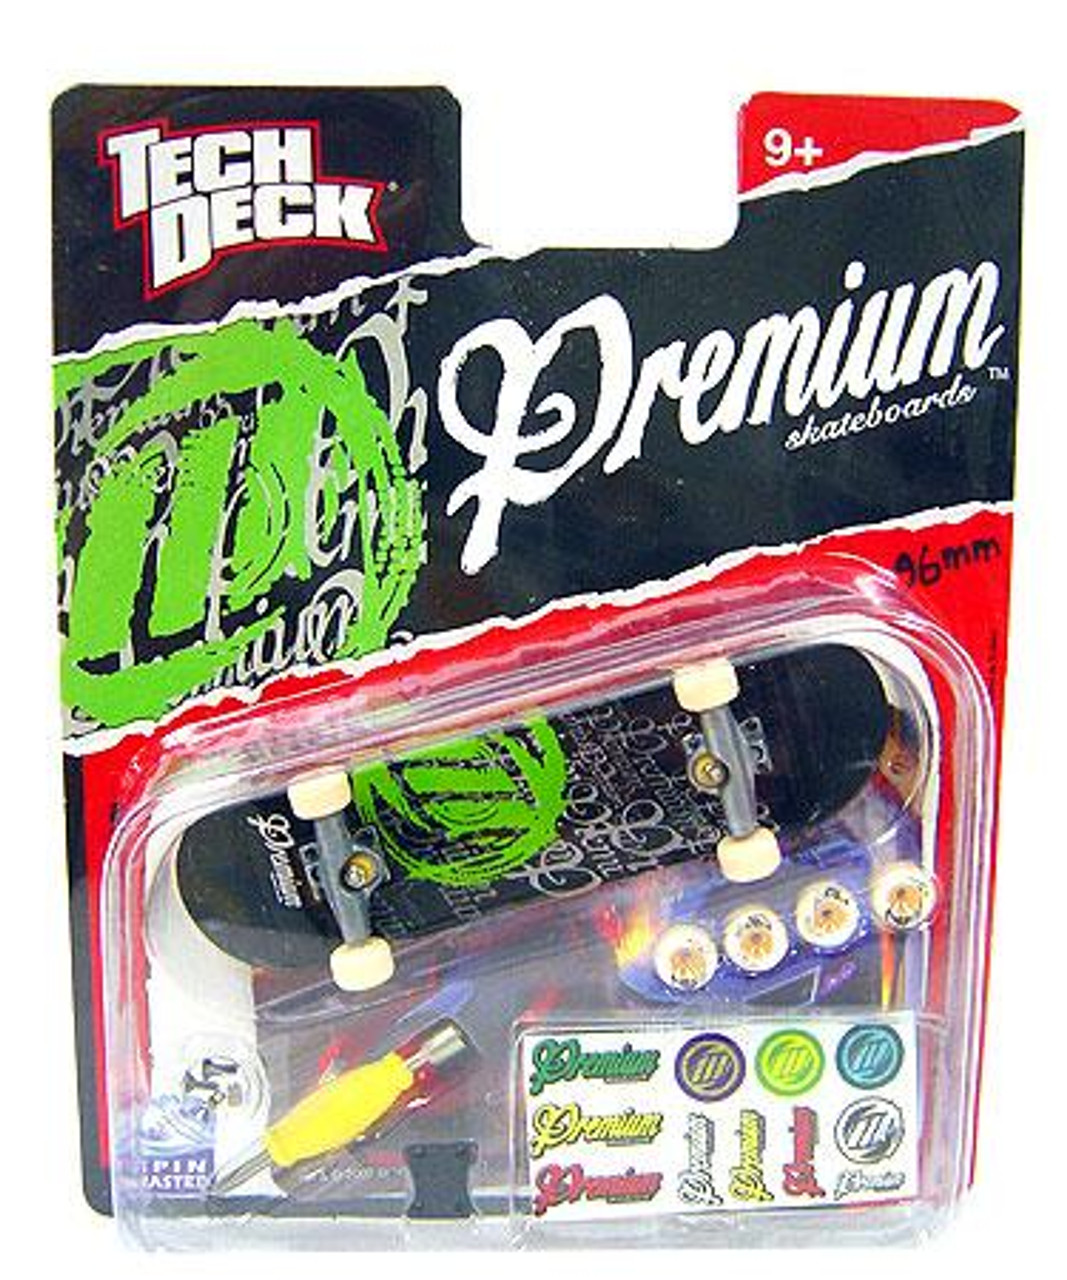 Tech Deck Premium 96mm Mini Skateboard [Black & Green]